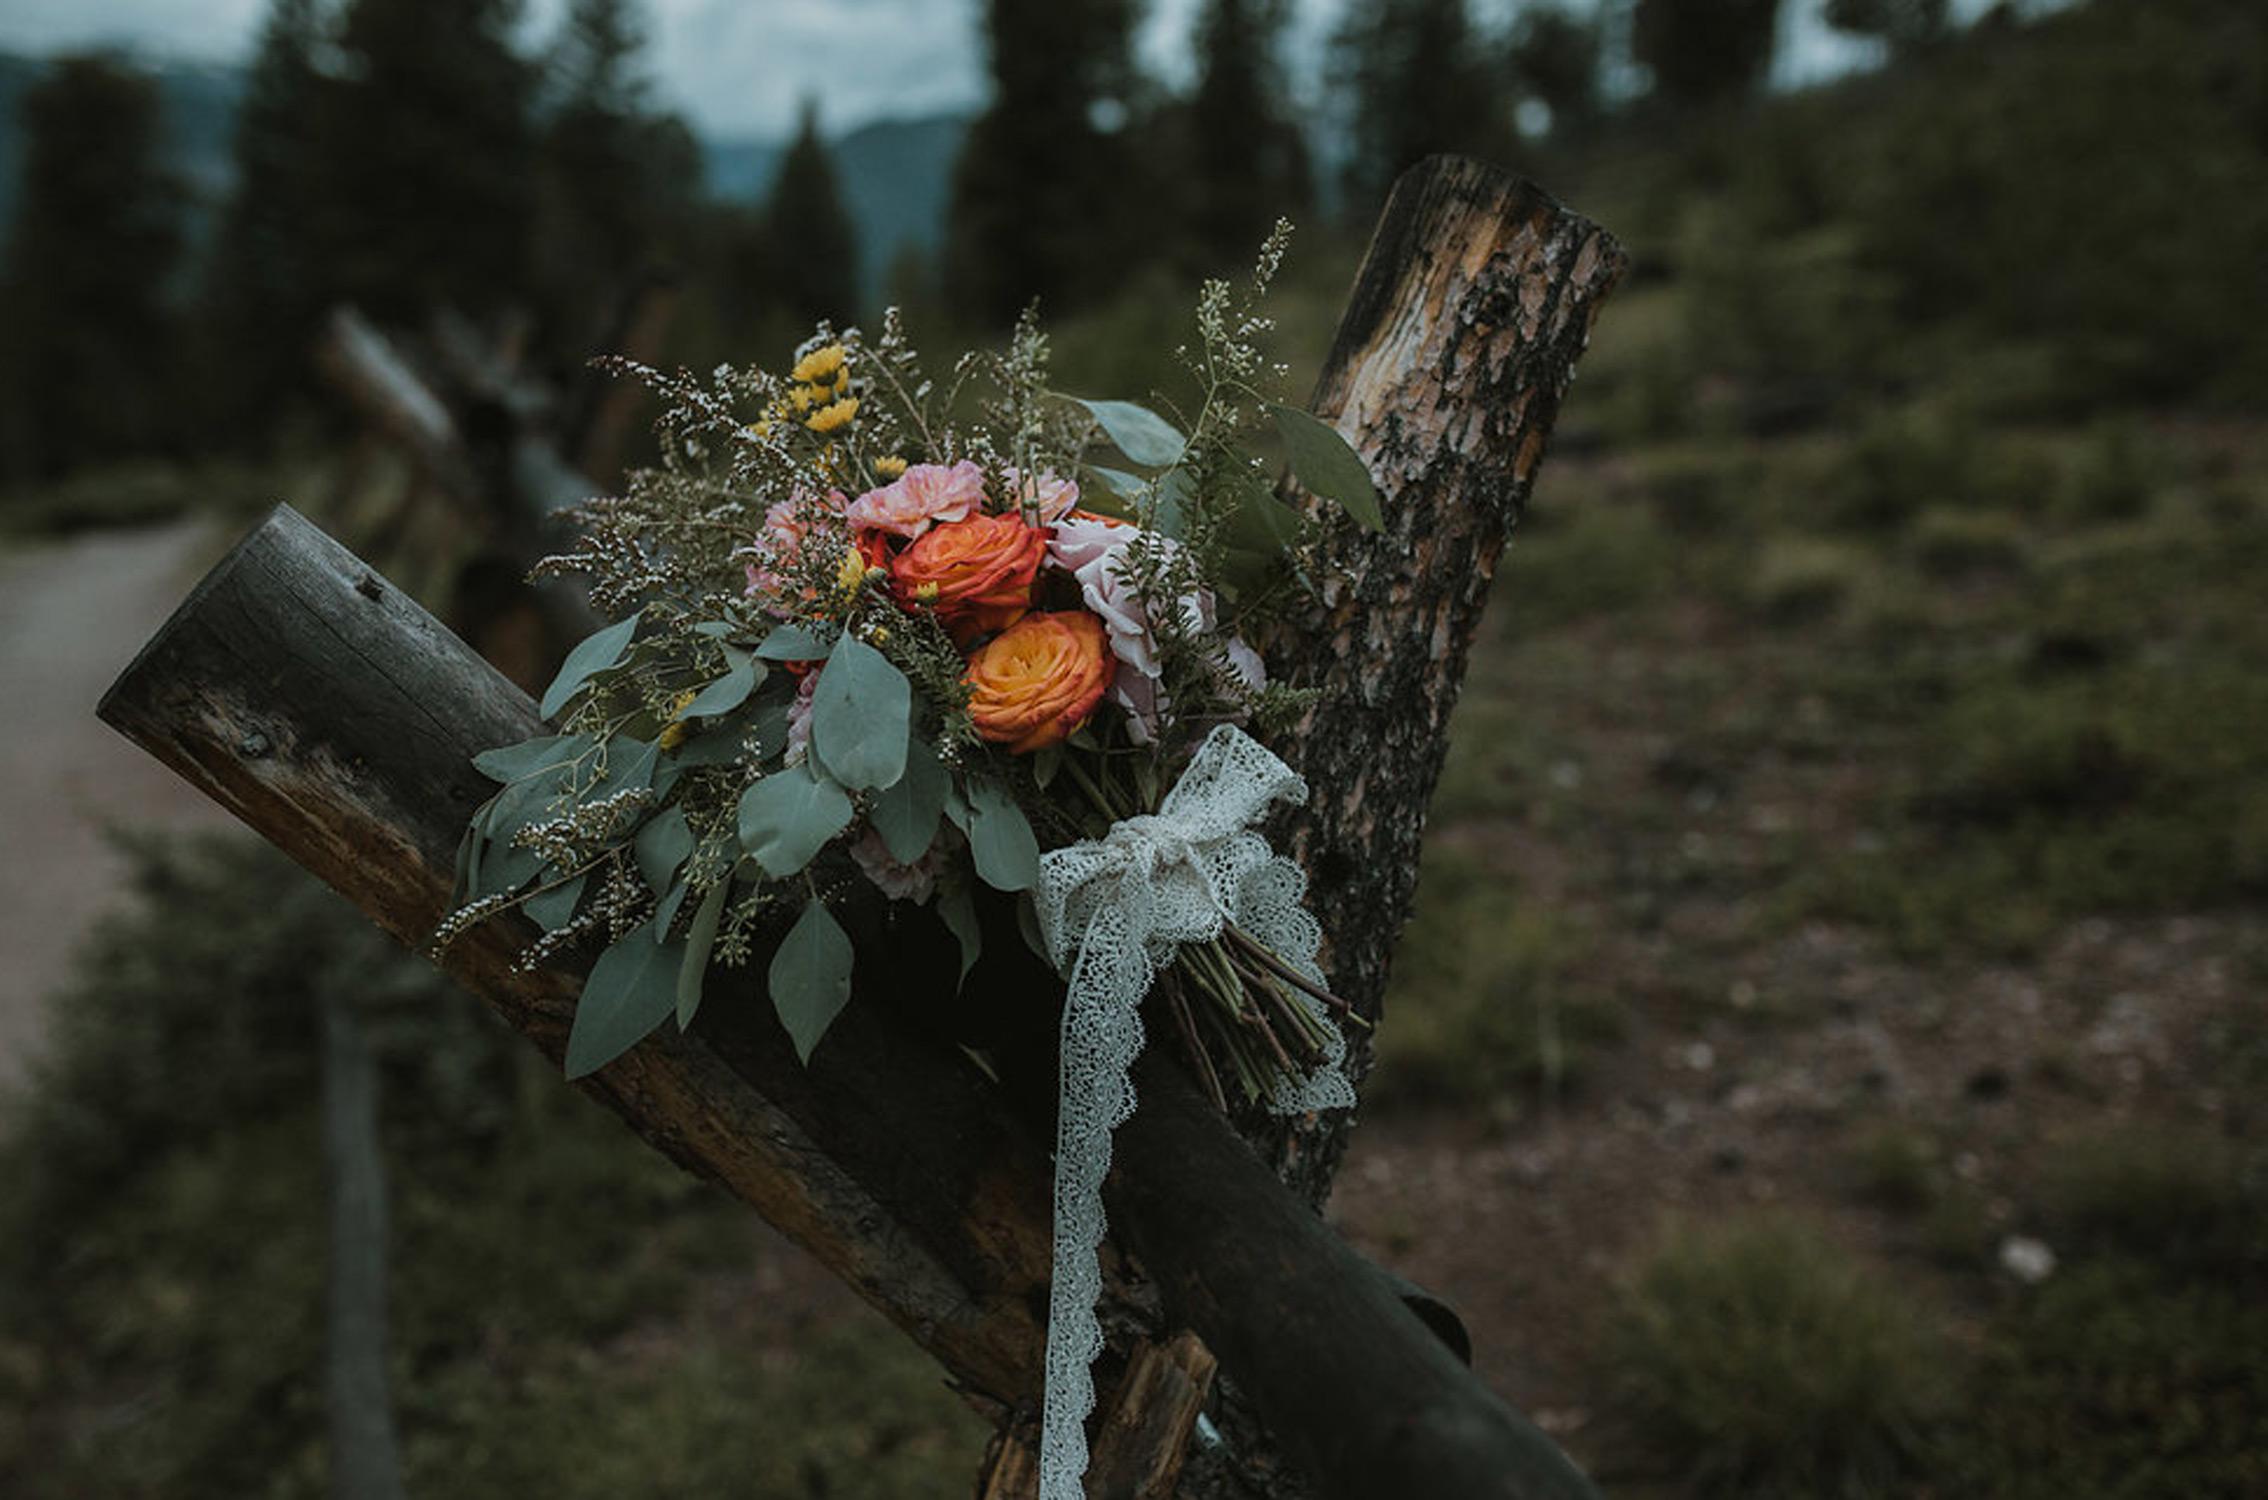 Boho Bride hand-tied bouquet - fresh flowers